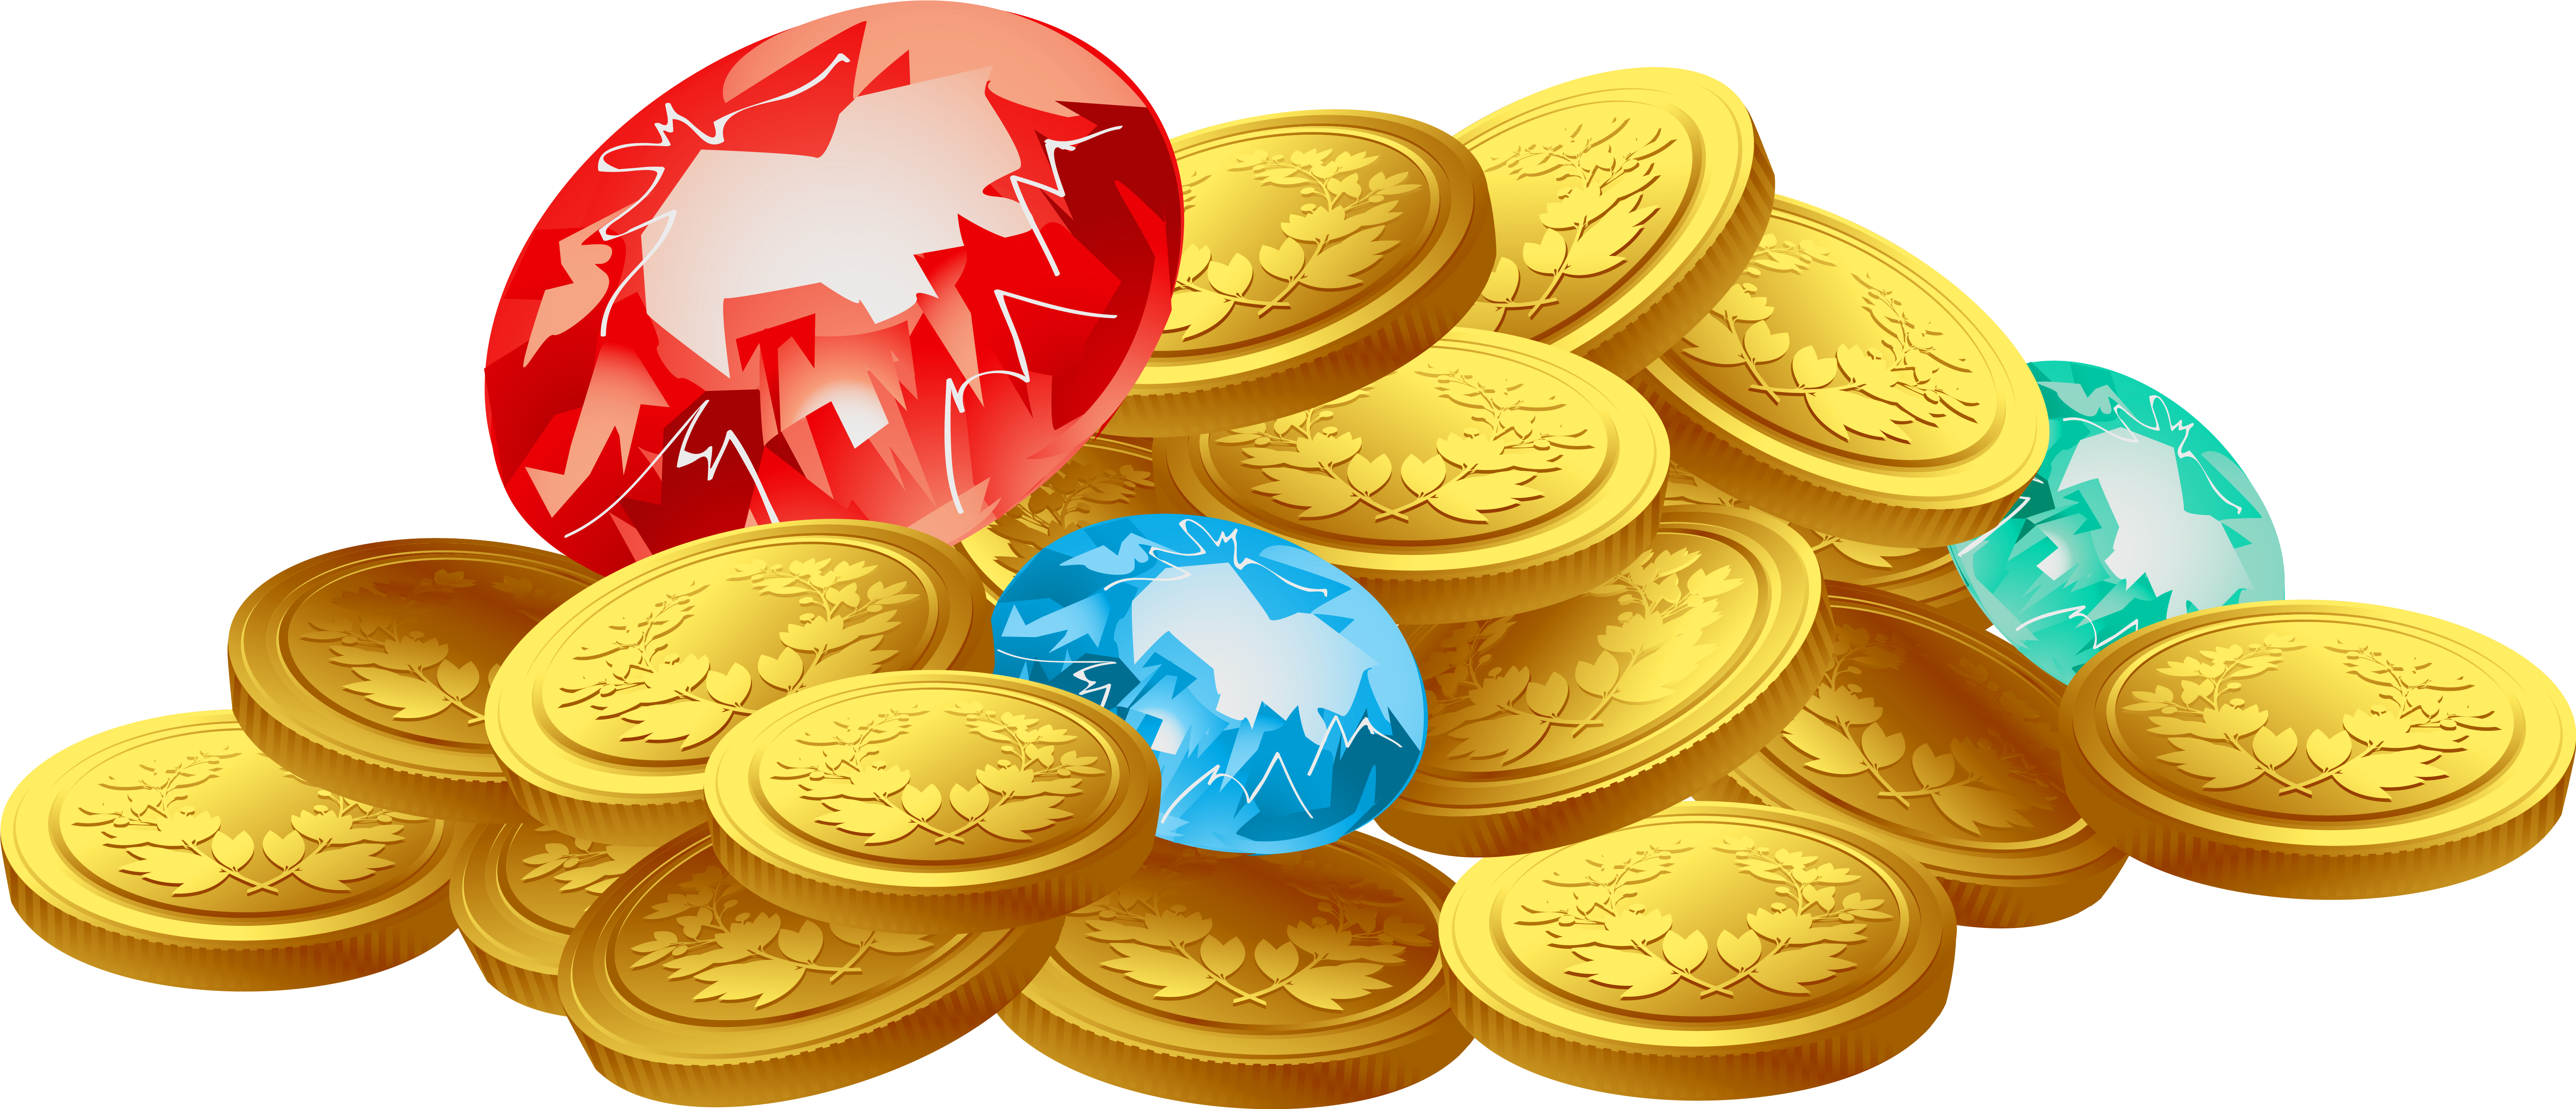 Картинки для монет